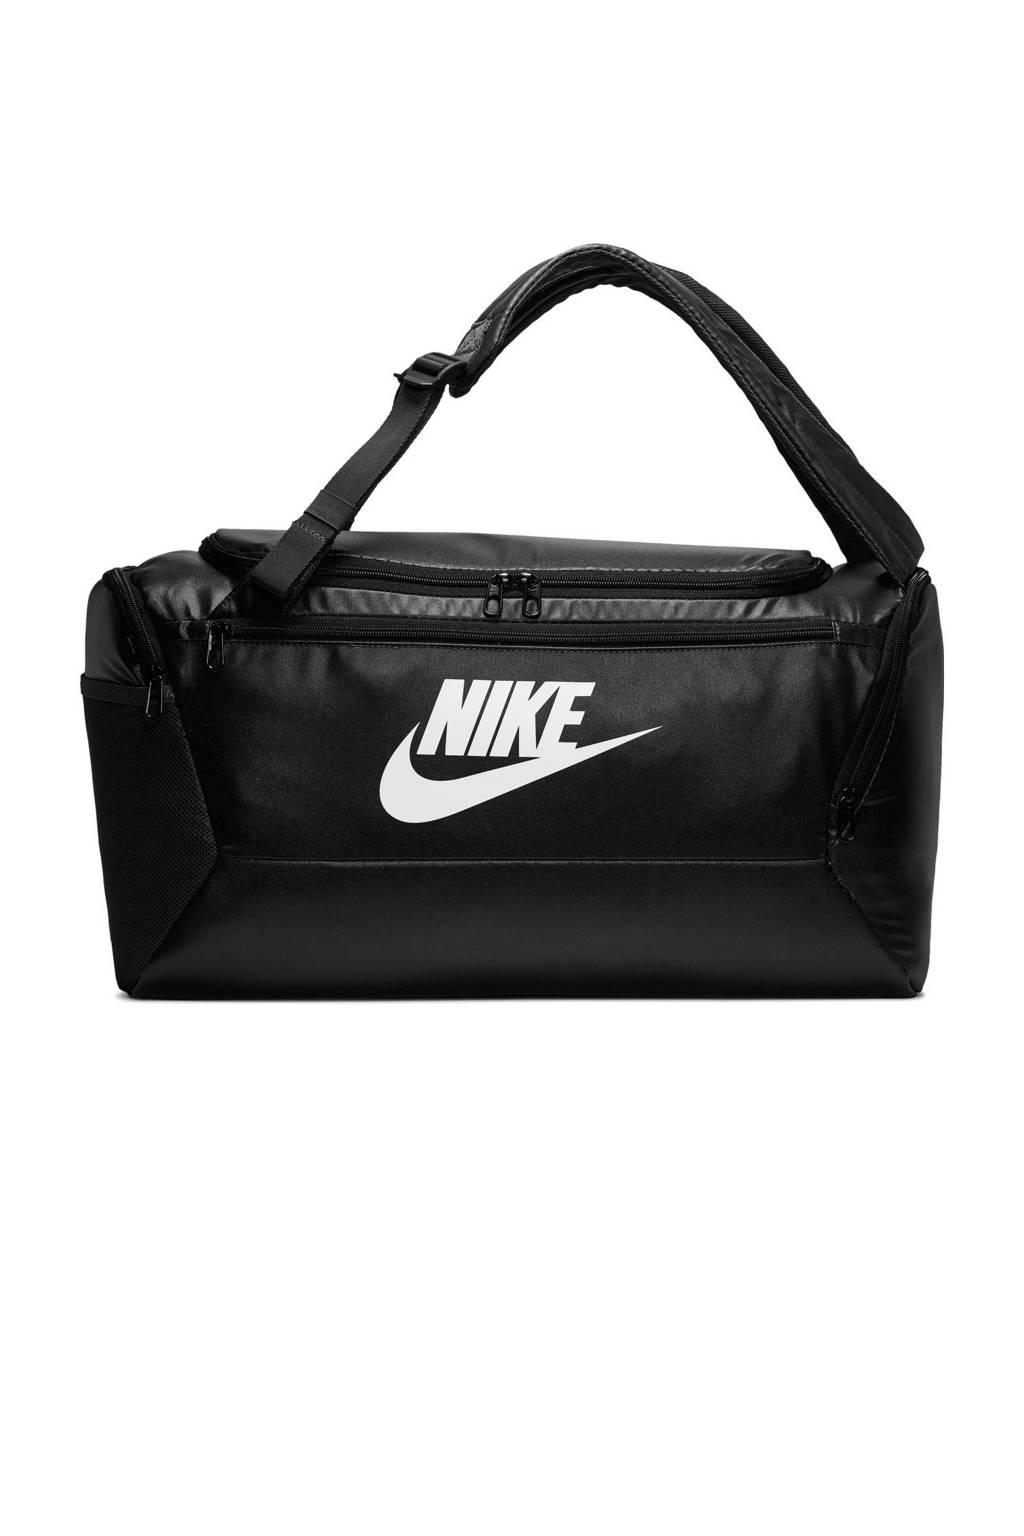 Nike   BRSLA DUFF  S sporttas zwart/wit, Zwart/wit